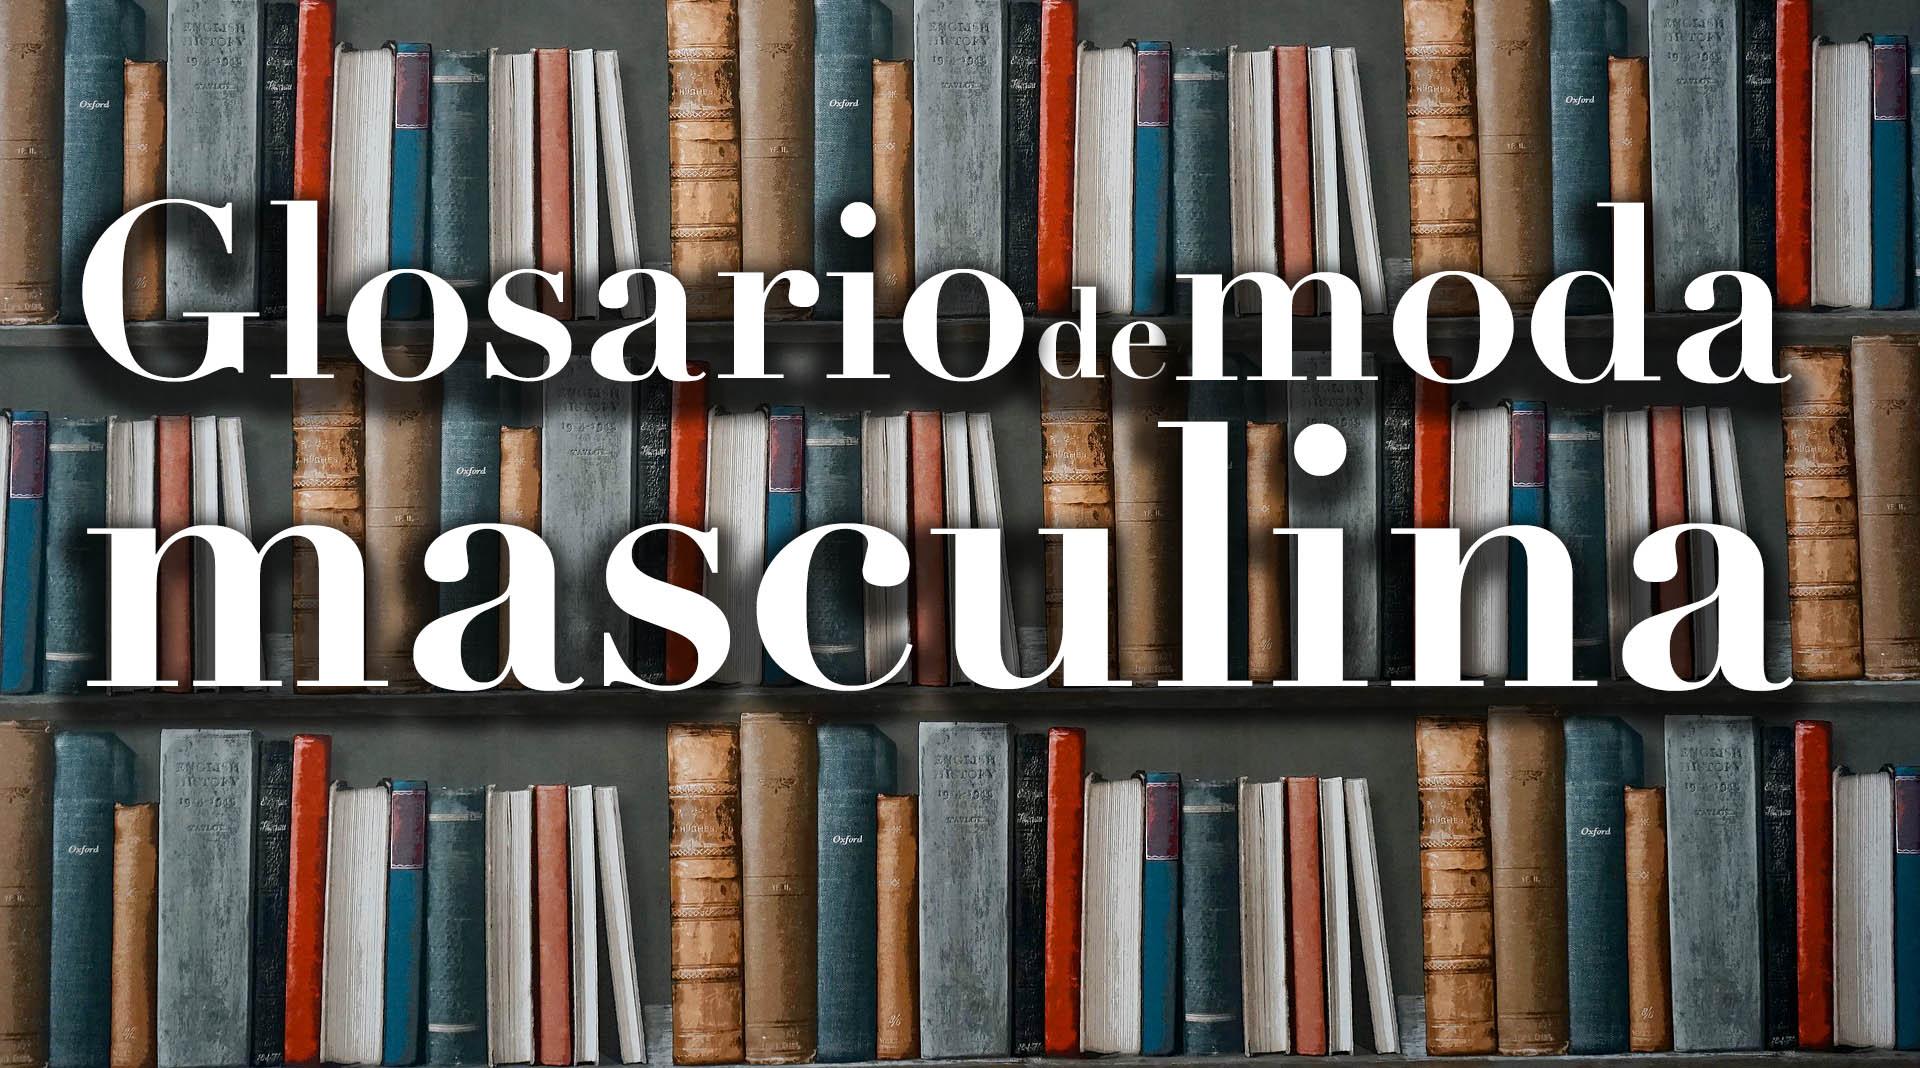 Glosario de moda masculina diccionario